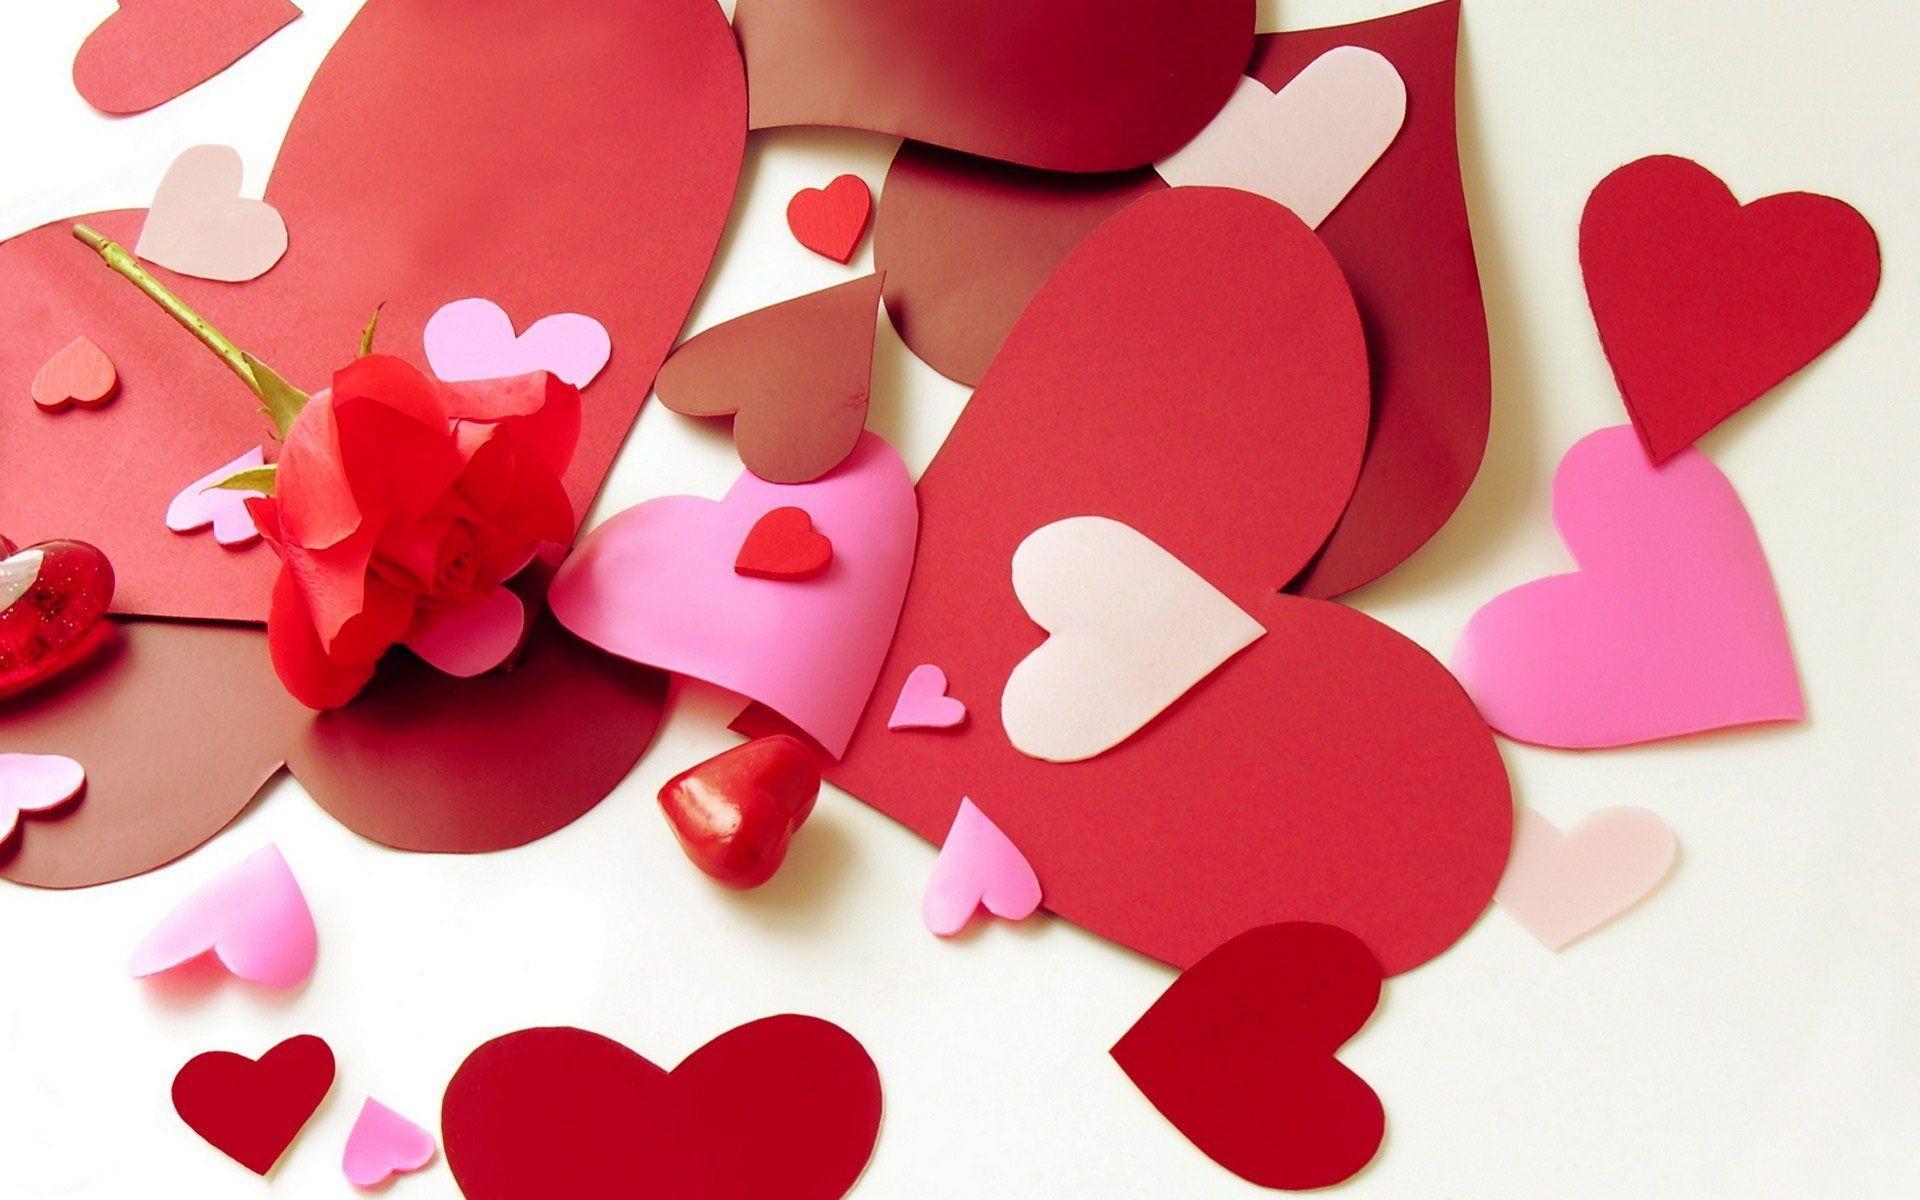 love-heart-wallpaper-download.jpg